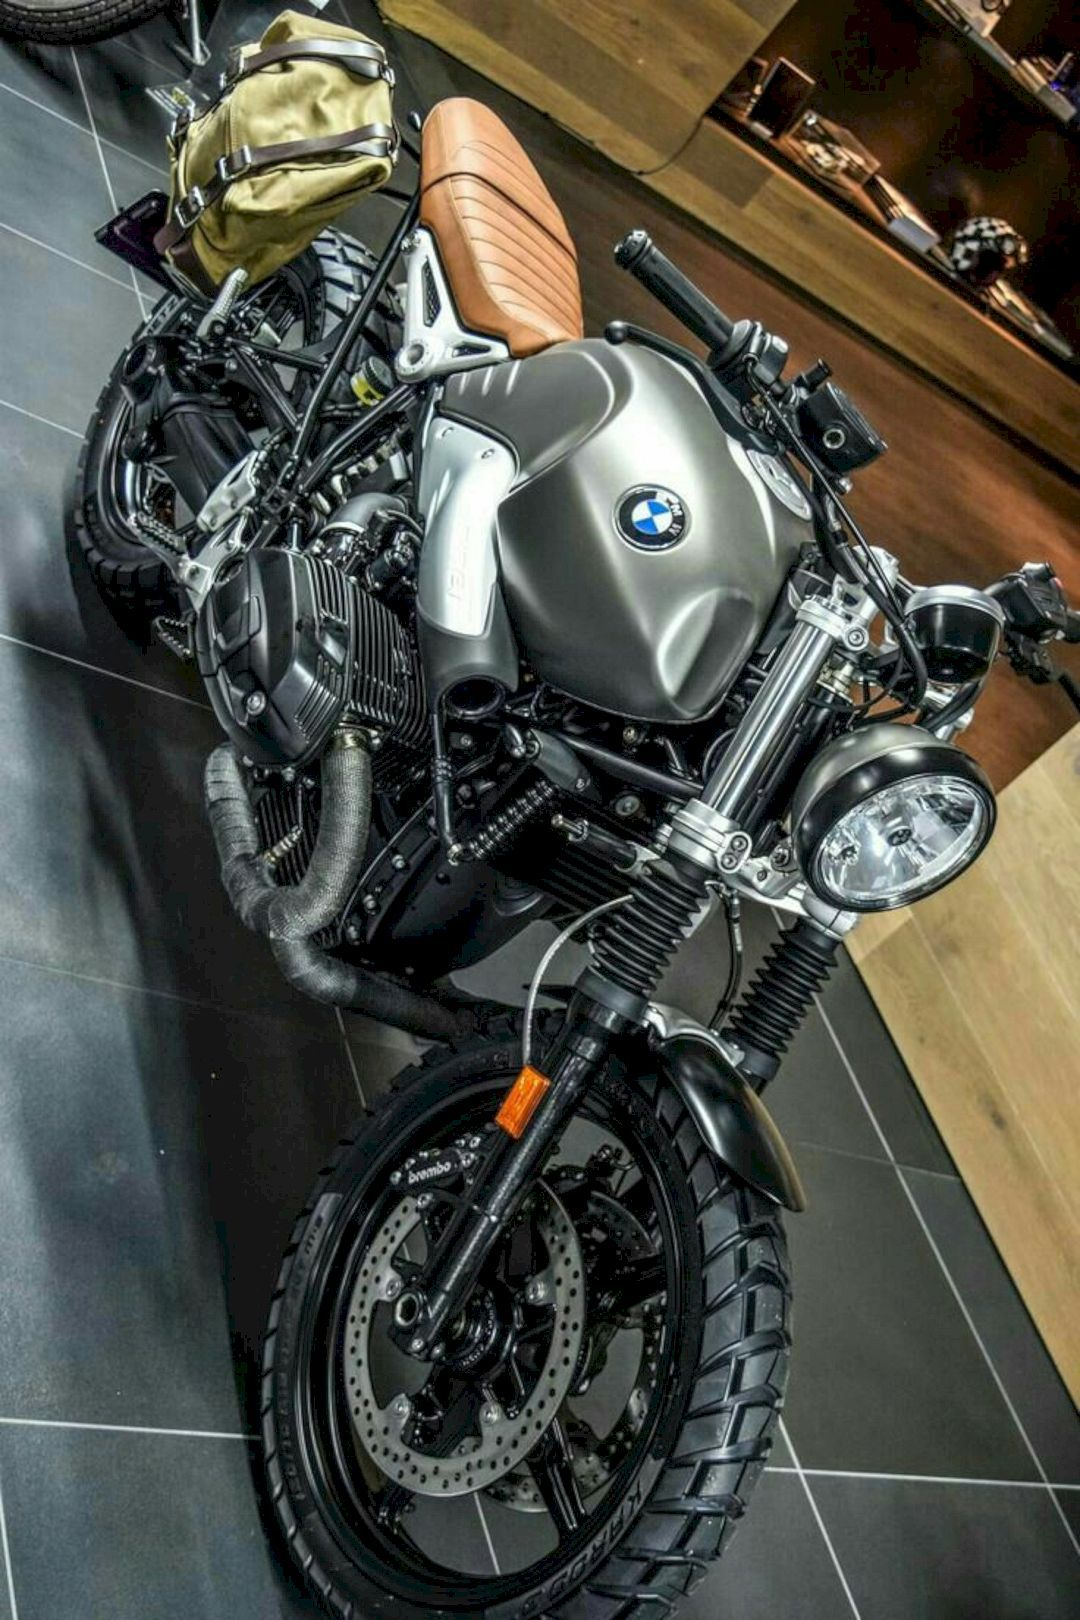 2020 Harley Davidson Softail Standard A Blank Canvas For